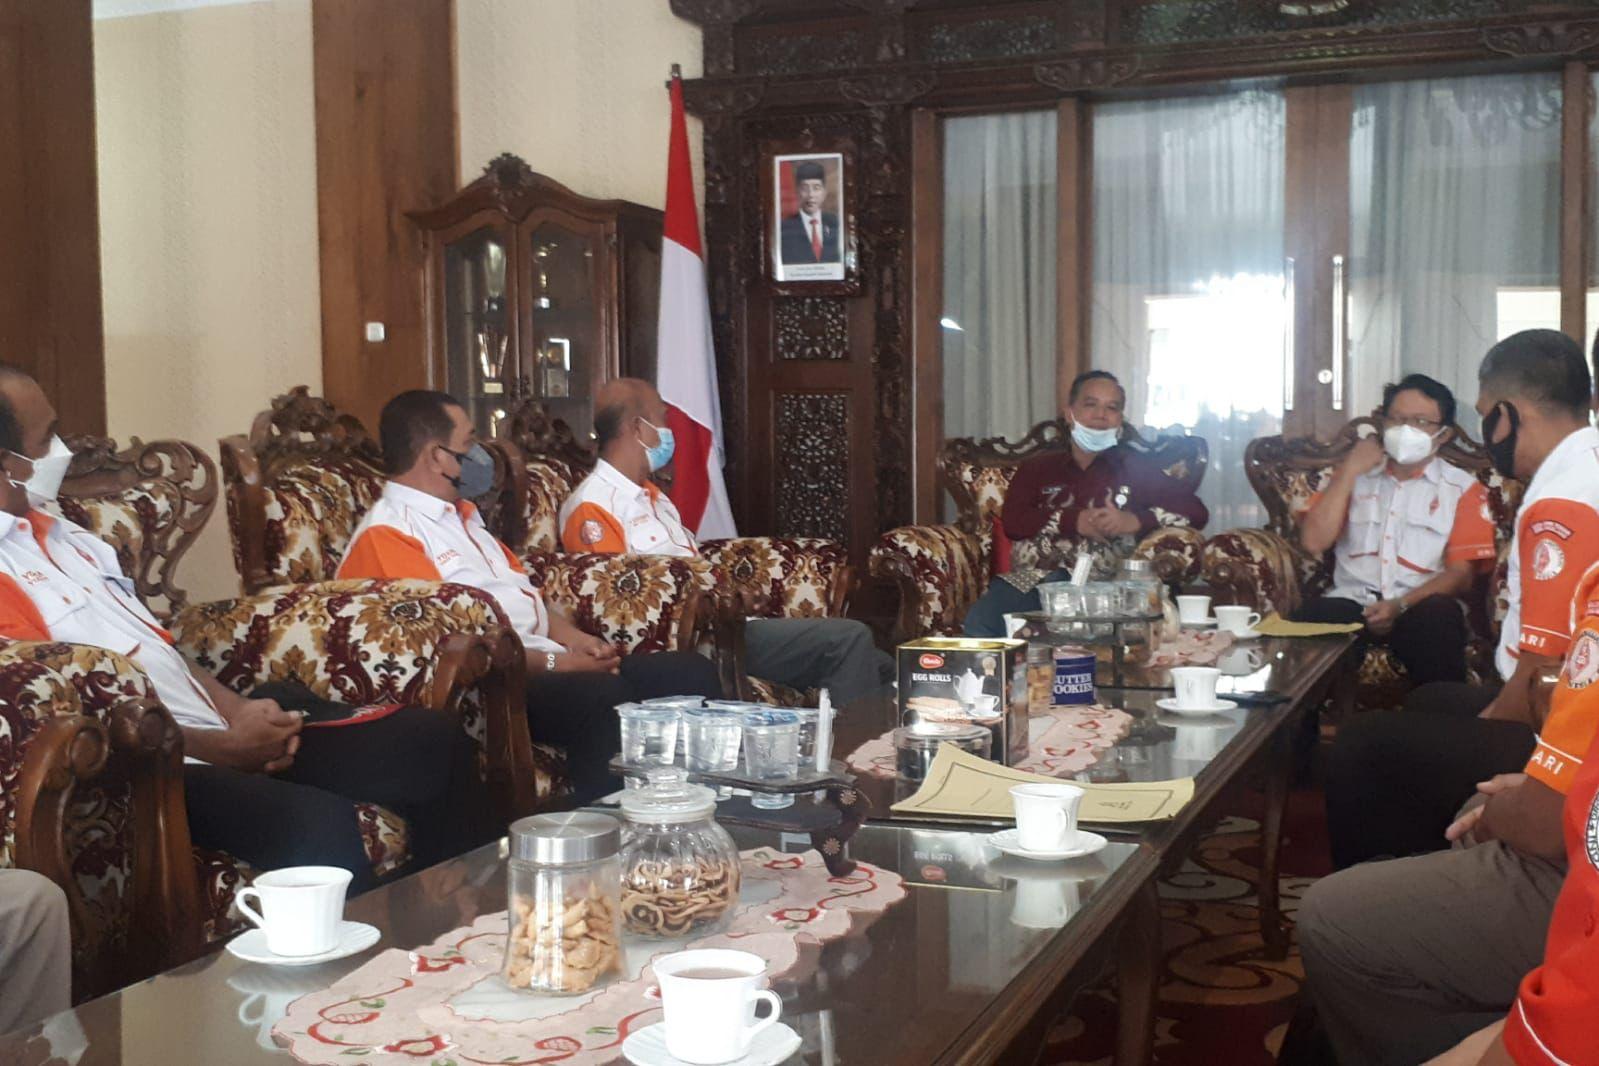 Audensi ORARI Lokal Kota Magelang dengan Walikota Magelang Jawa Tengah